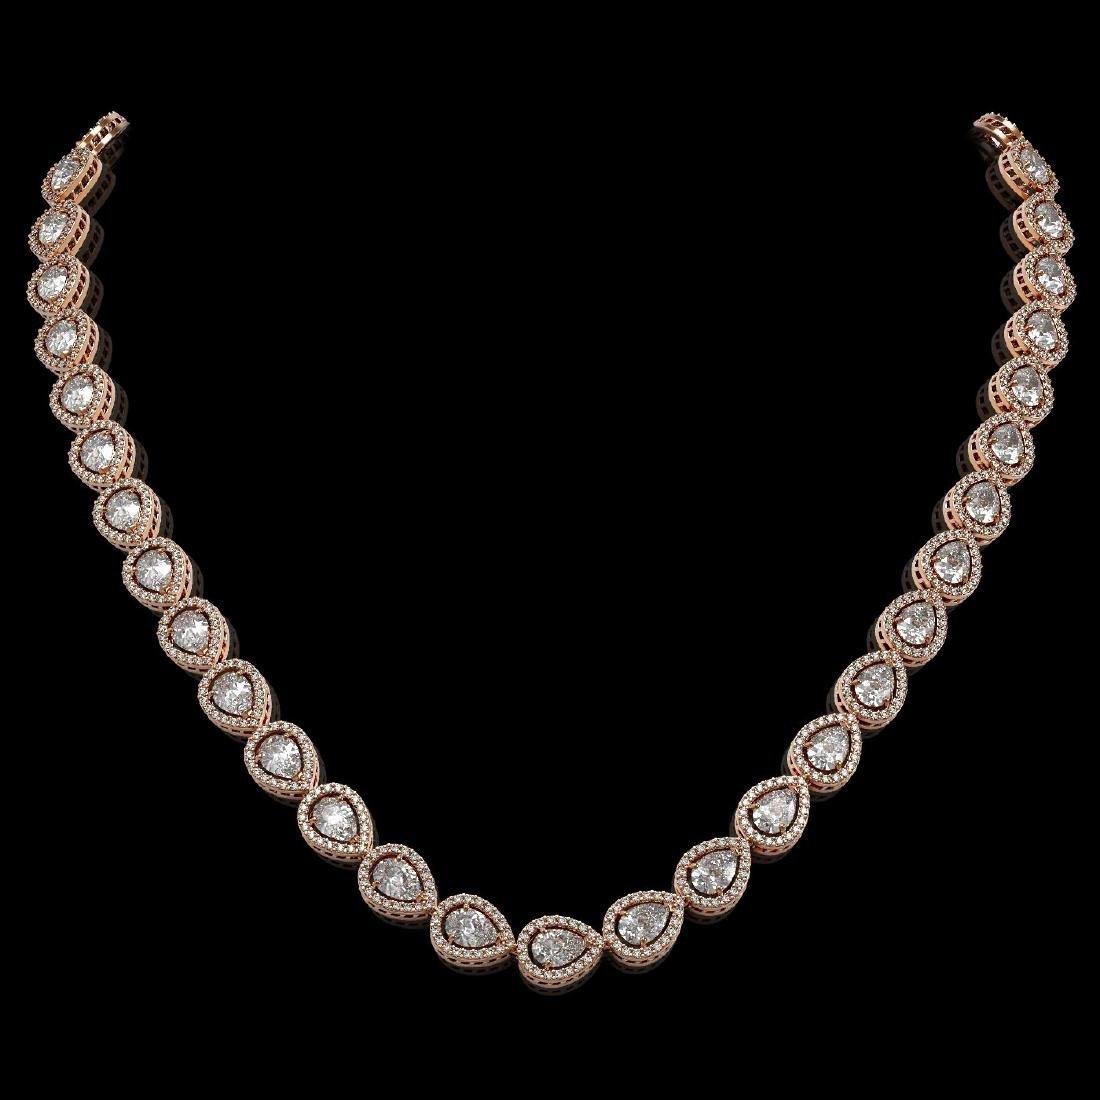 28.74 CTW Pear Diamond Designer Necklace 18K Rose Gold